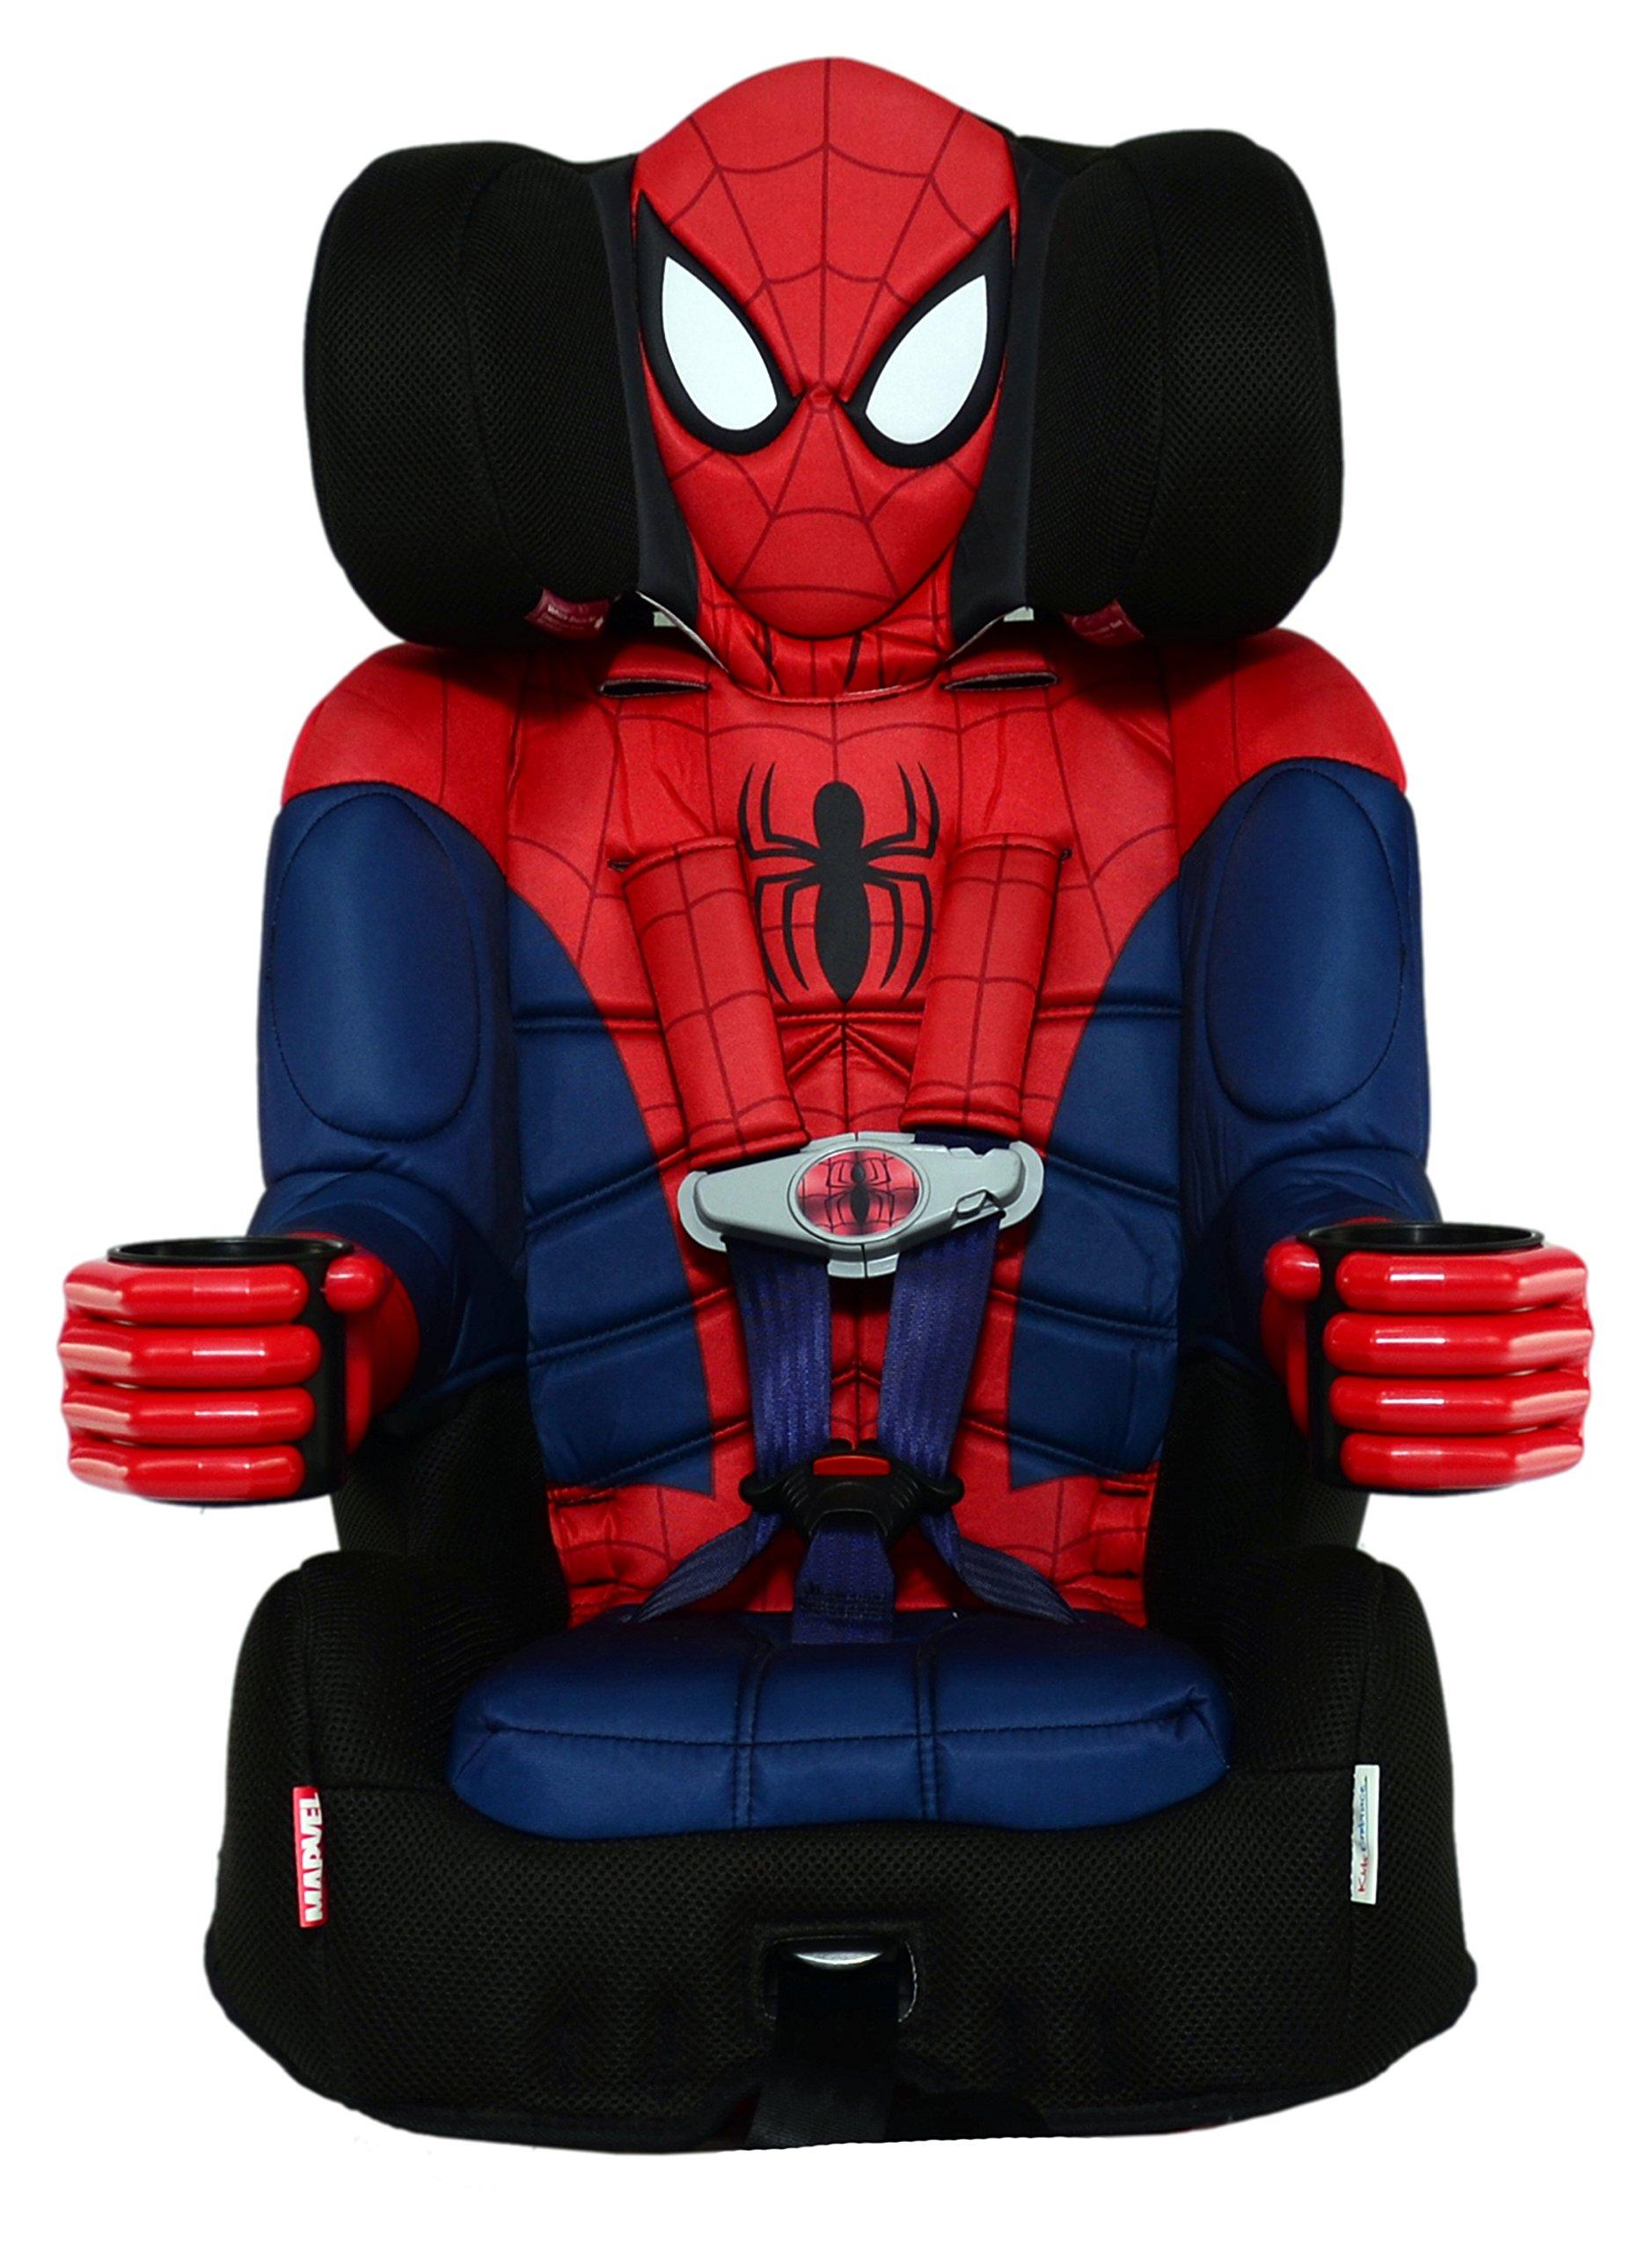 Disney Kidsembrace Combination Toddler Harness Booster Car Seat Marvel Ultima.. 24